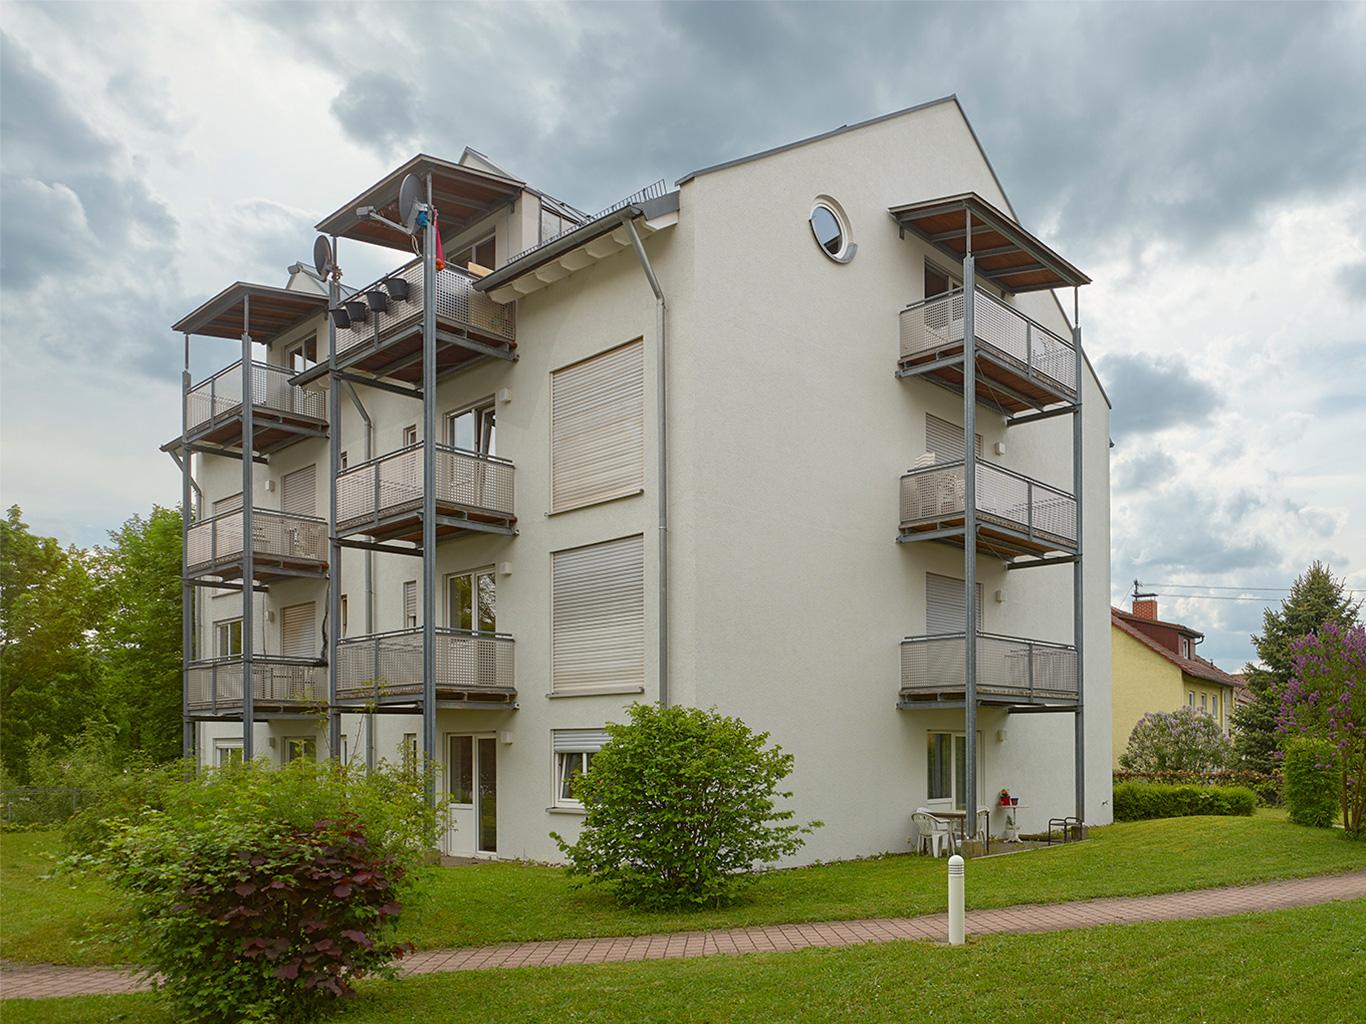 A_Auáenansicht_Haus-34-2